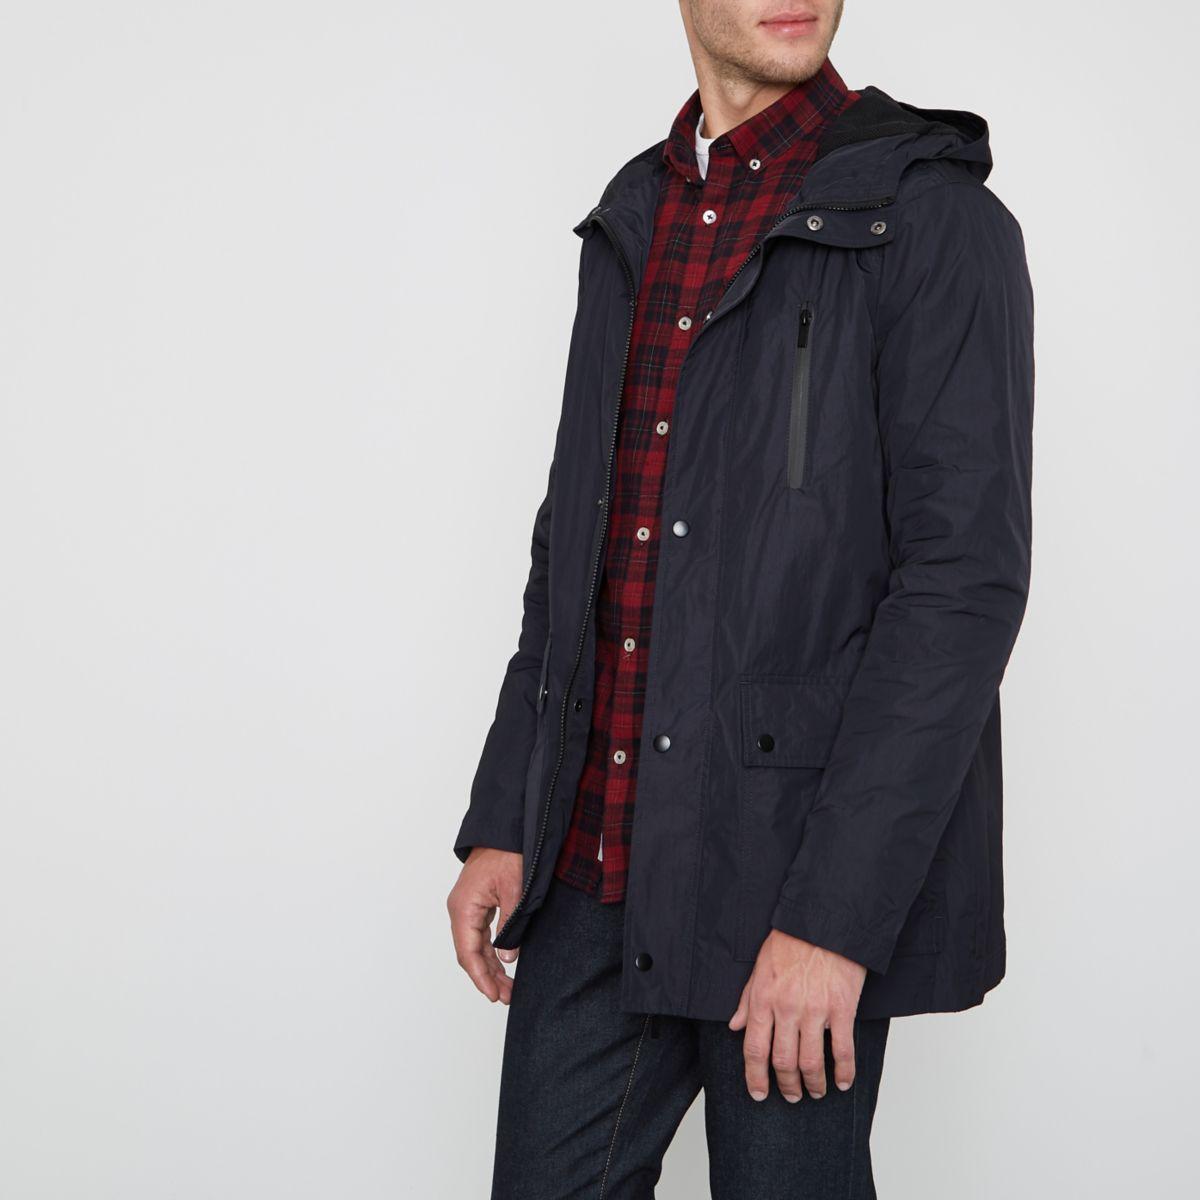 Navy lightweight hooded jacket